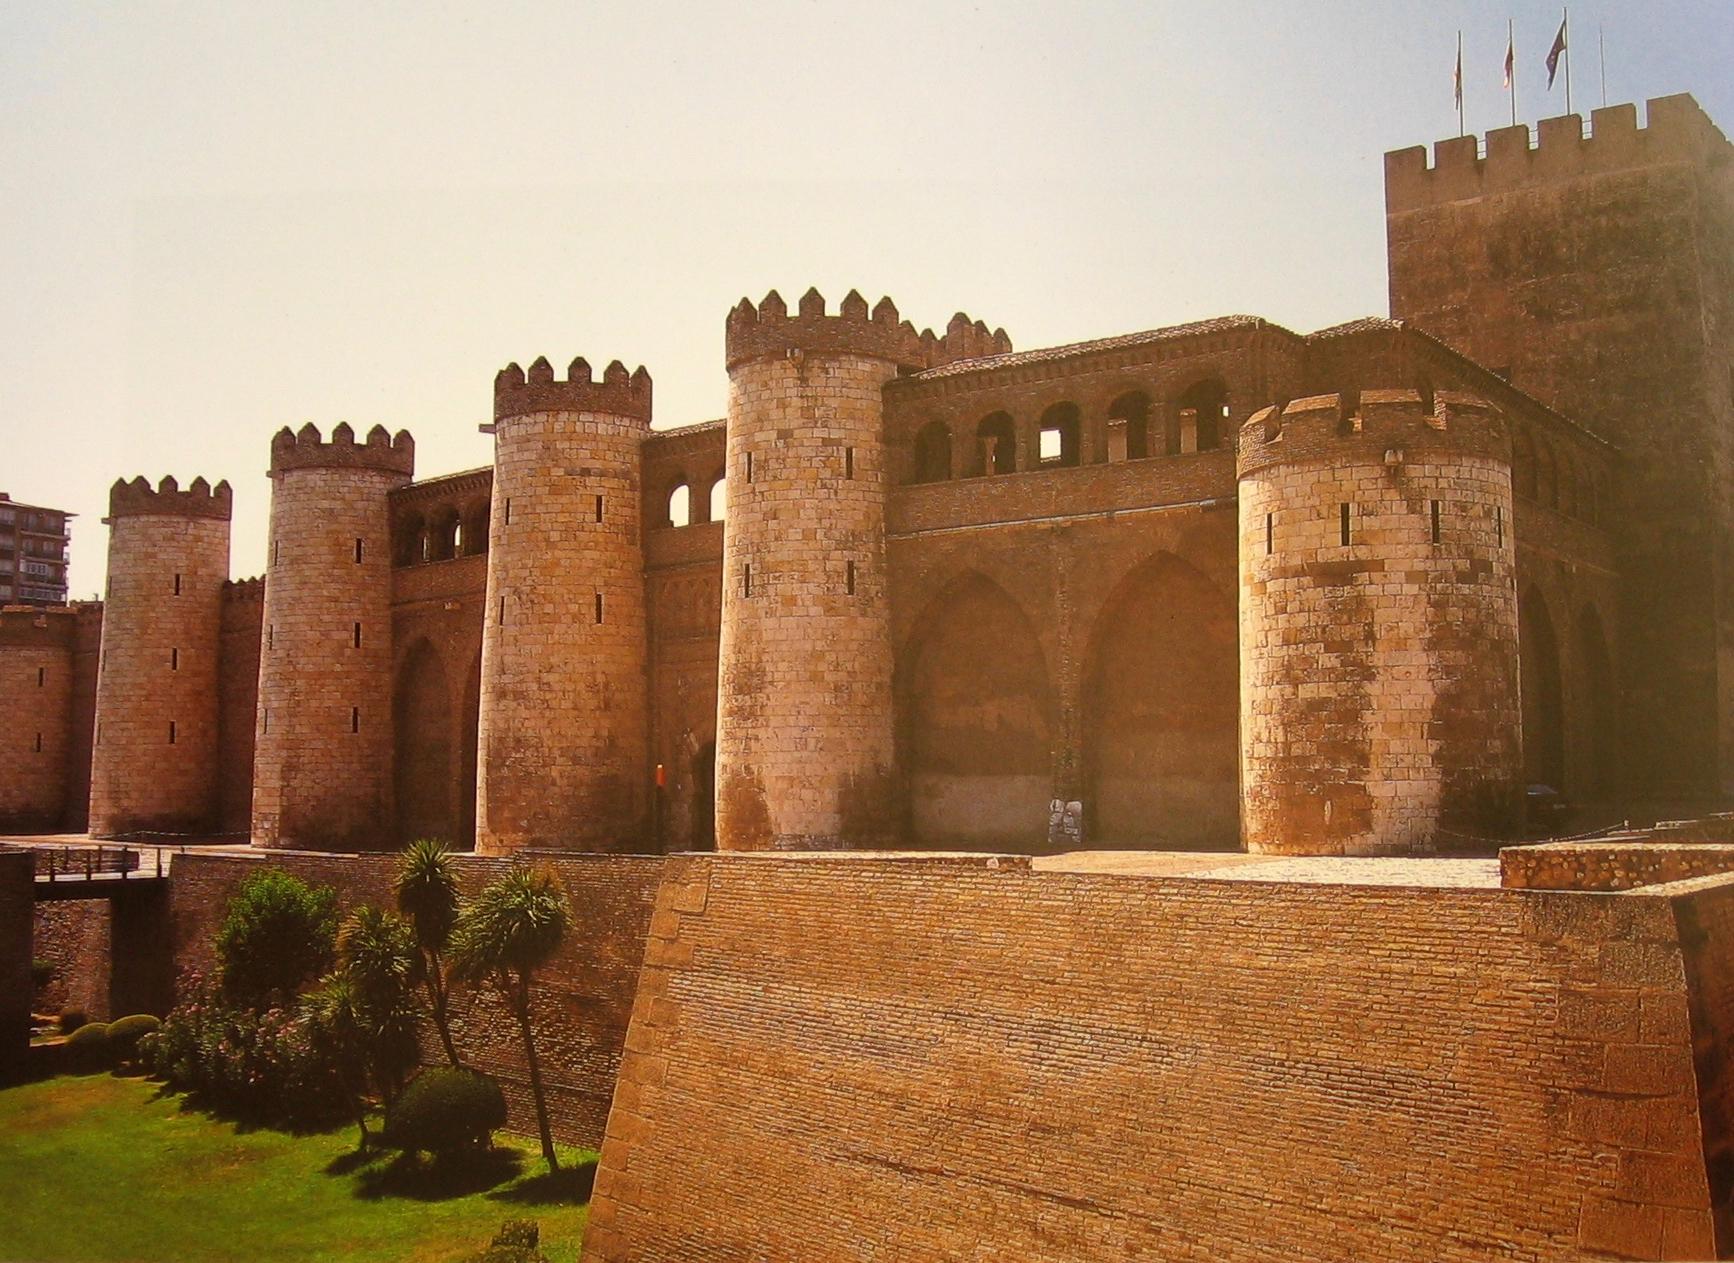 Španělsko, Zaragoza, Aljaferíja